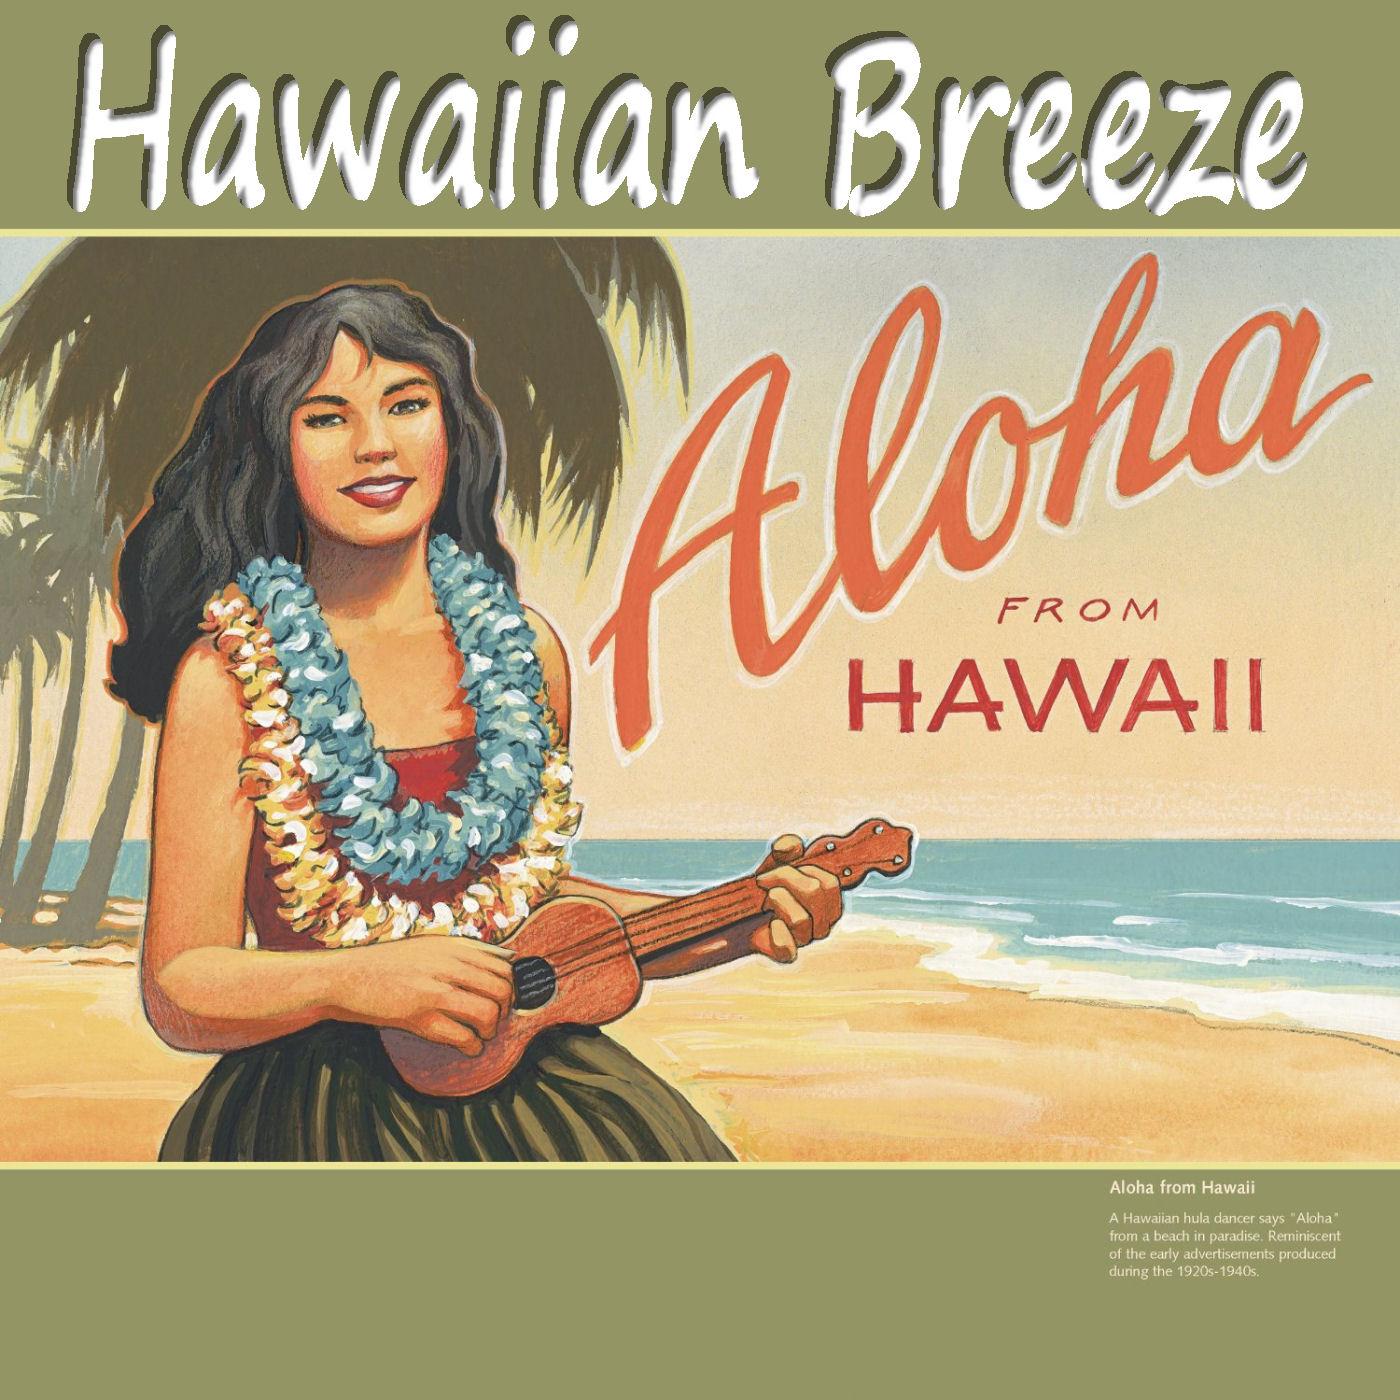 Hawaiian Breeze Credit: Larry W Jones